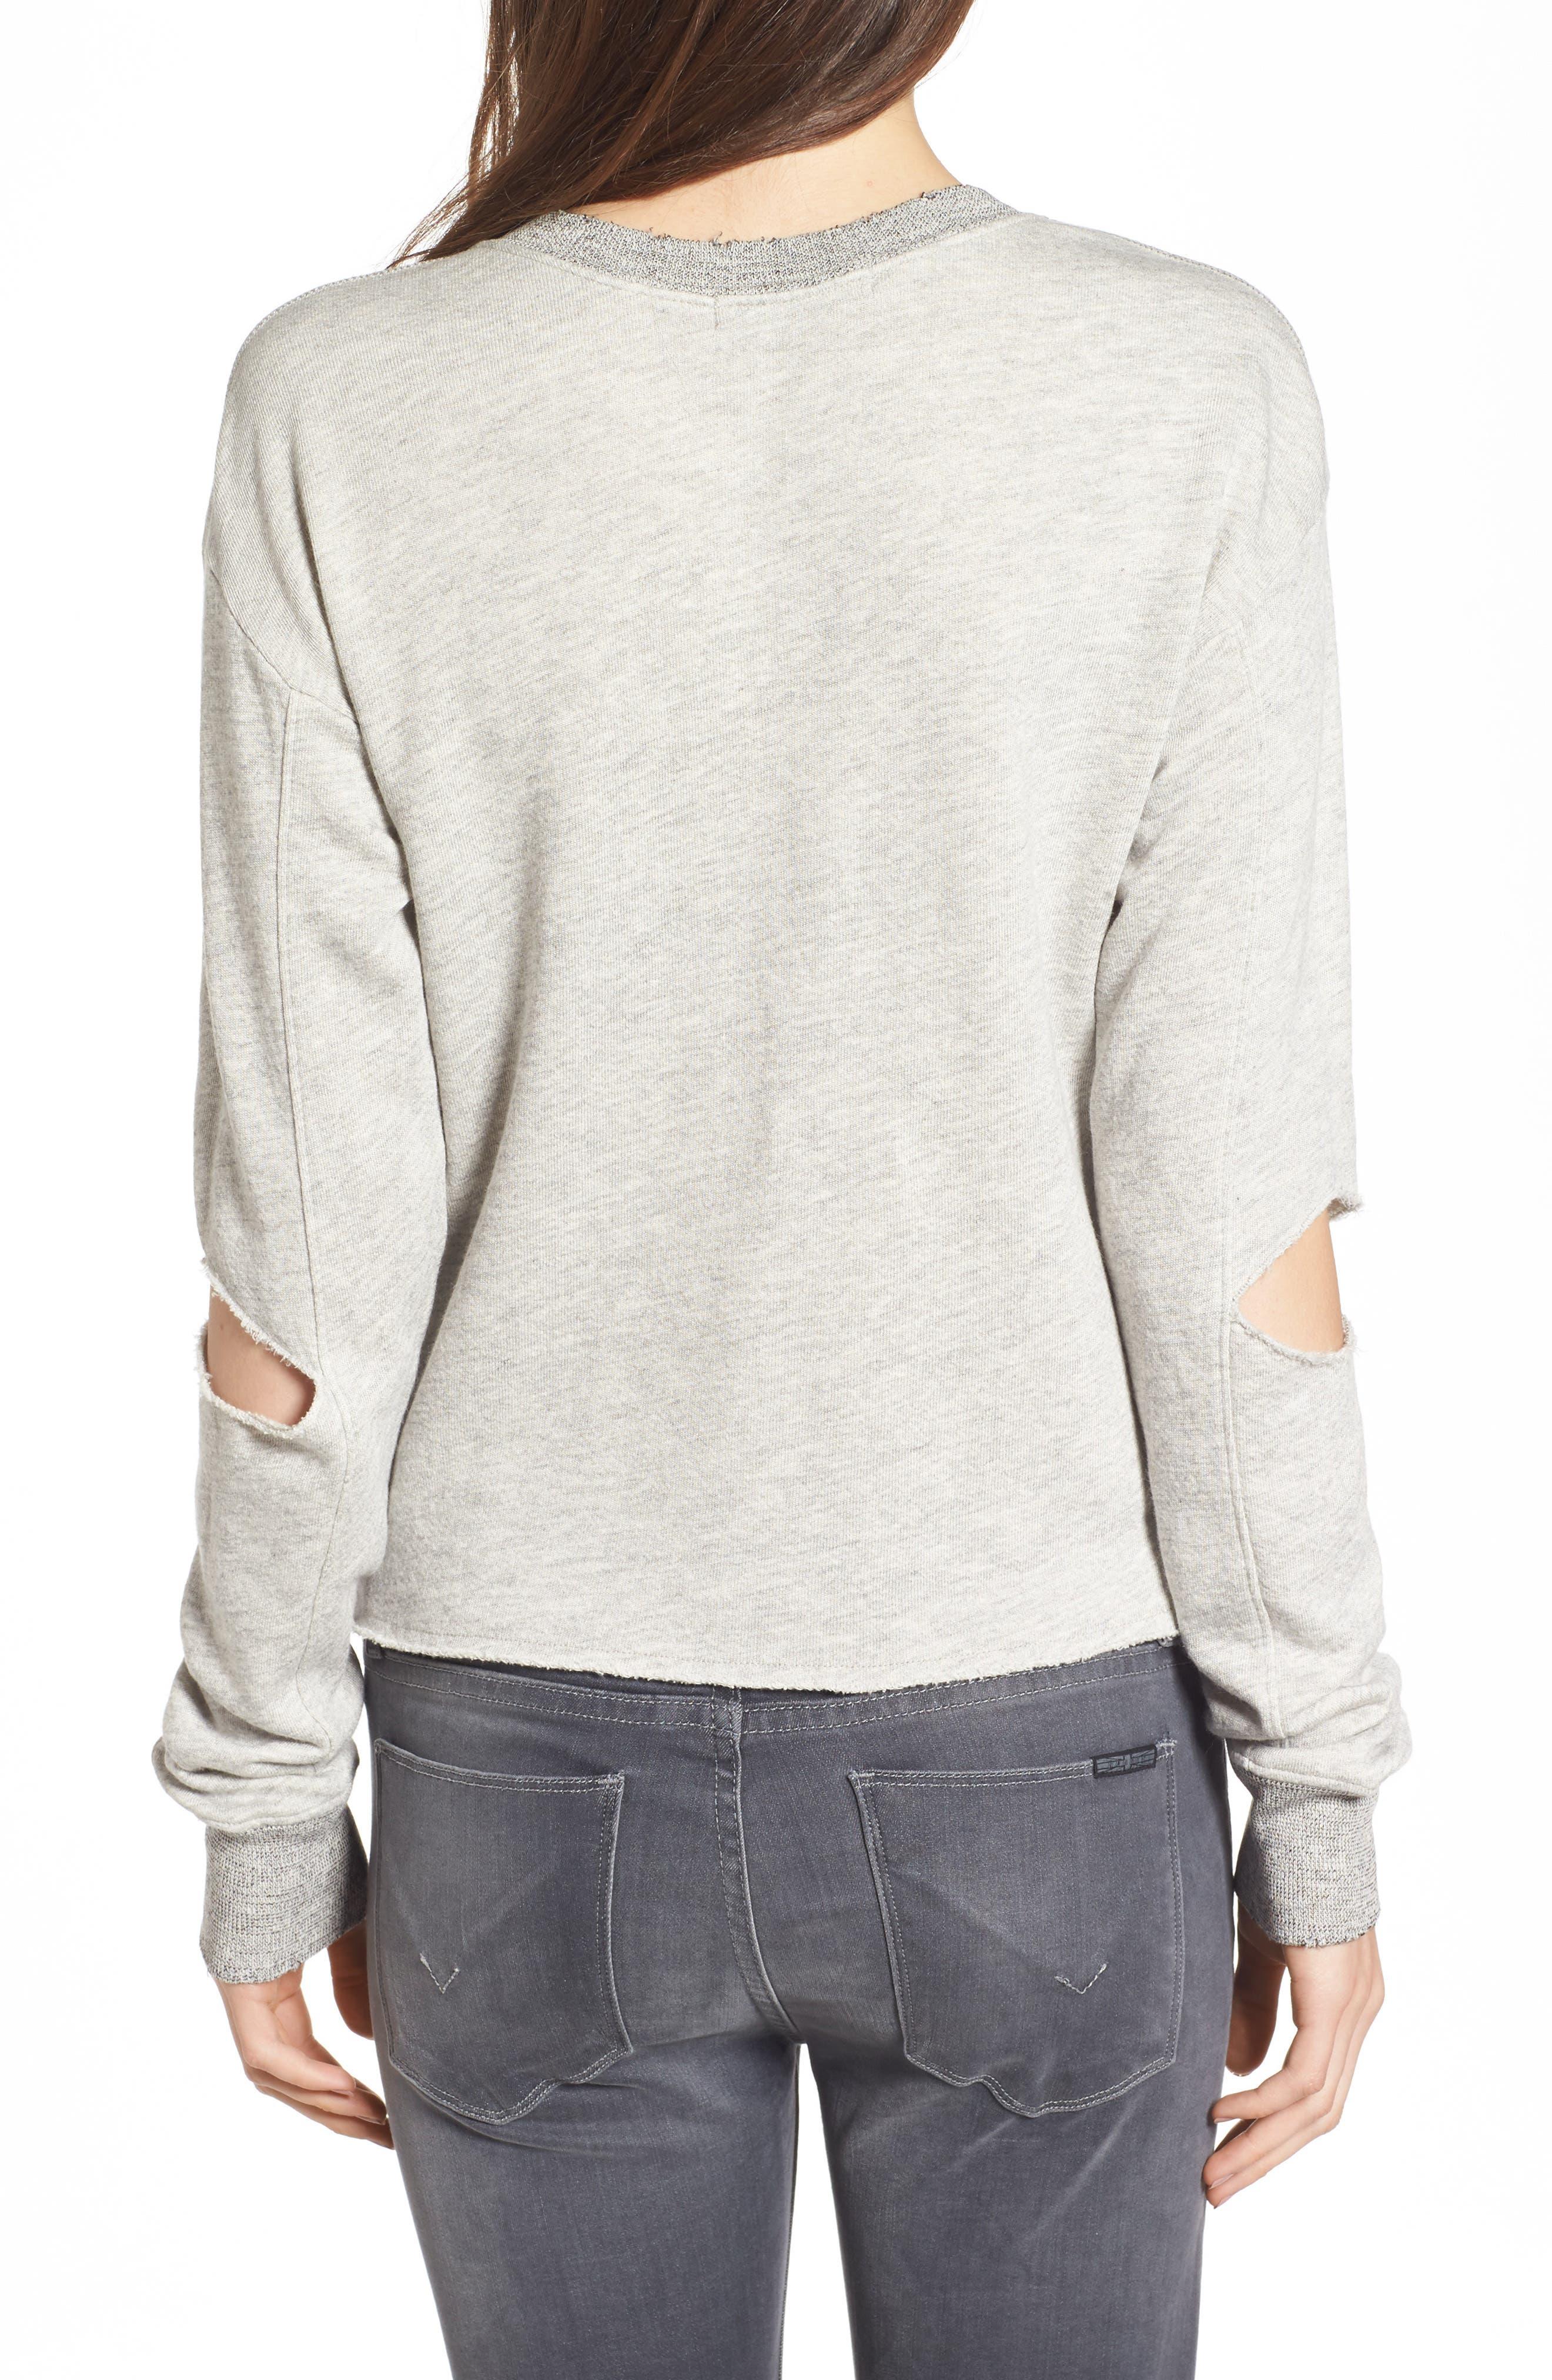 Savannah Cutout Sweatshirt,                             Alternate thumbnail 2, color,                             030